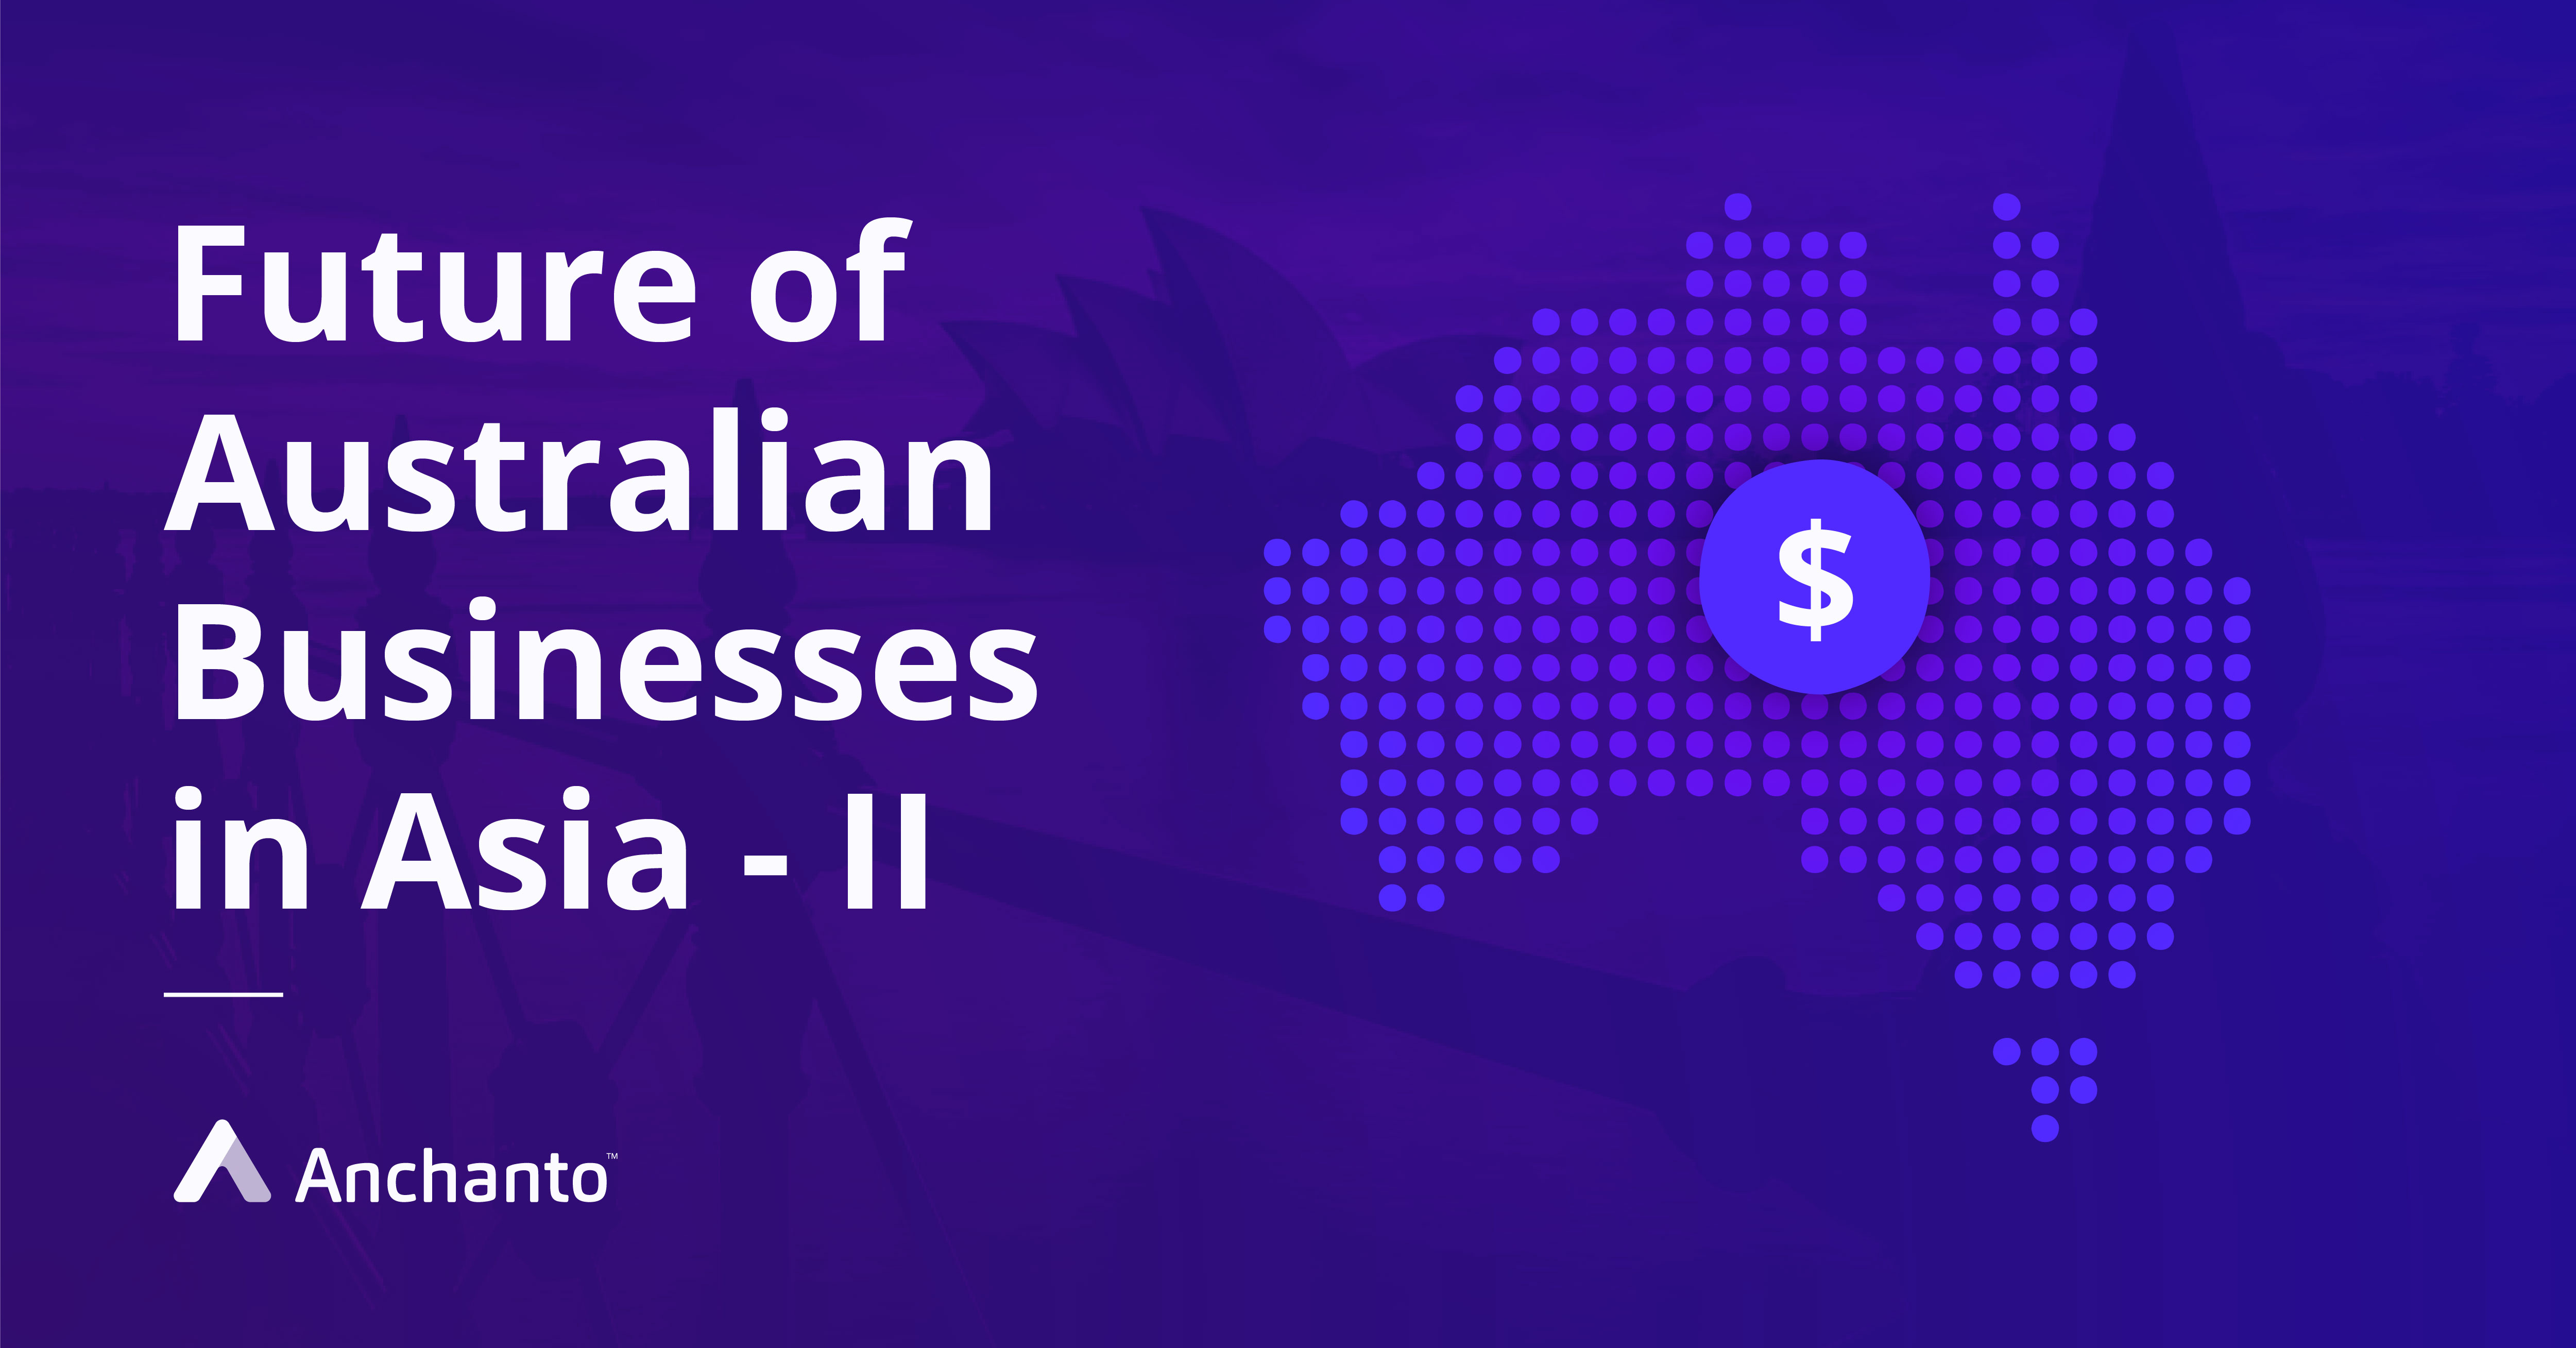 exploring_the_future_of_australian_businesses_in_asia_ii